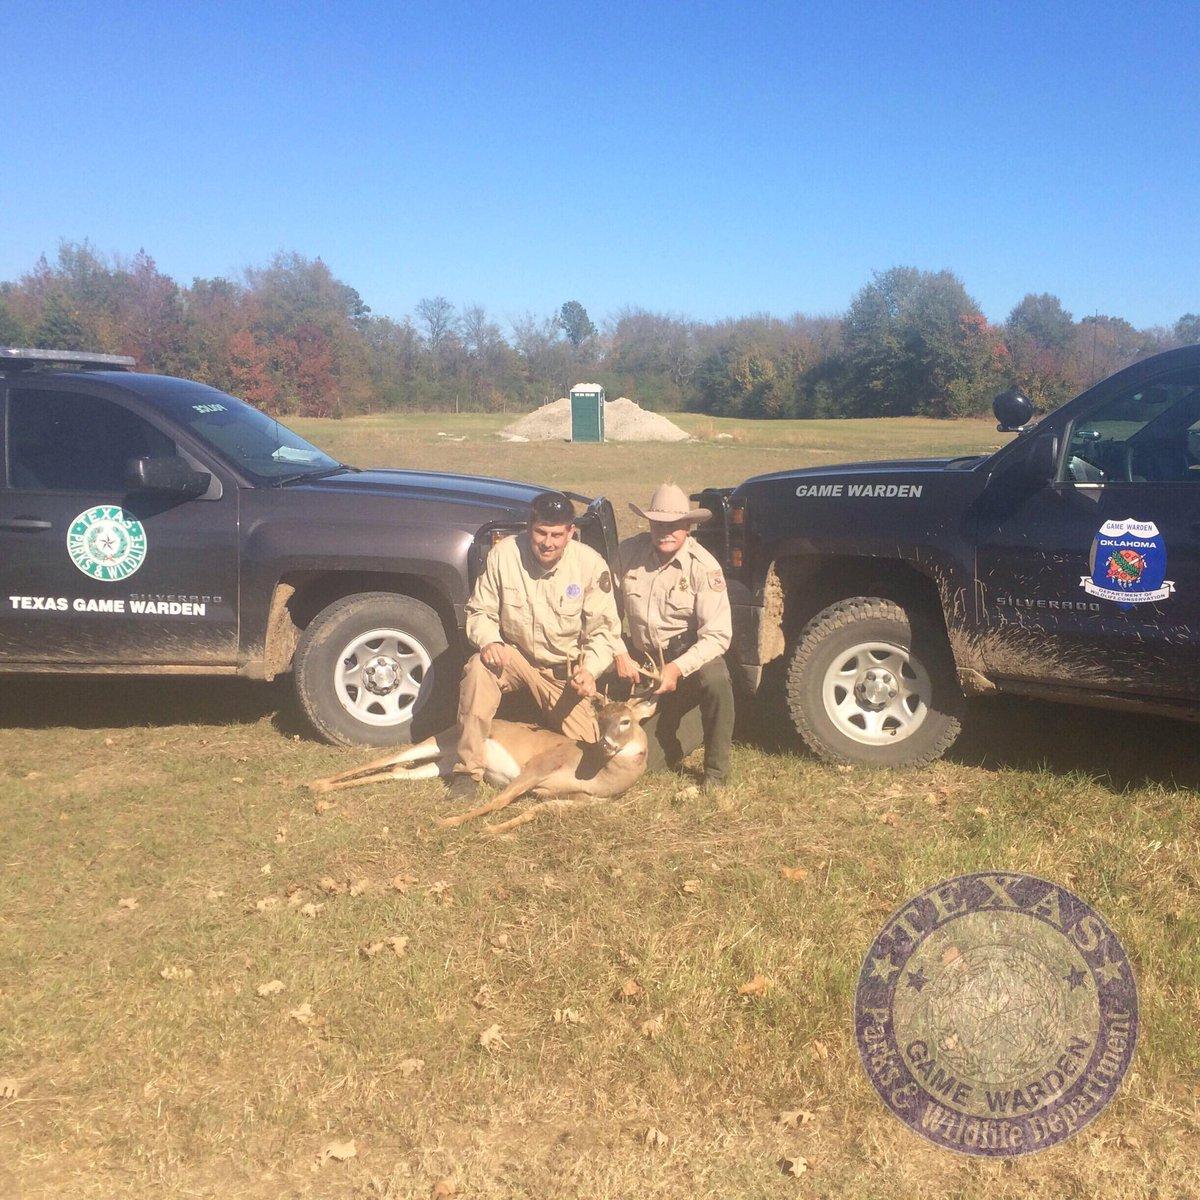 Texas Game Warden Auf Twitter Vehicle Stop On Texas